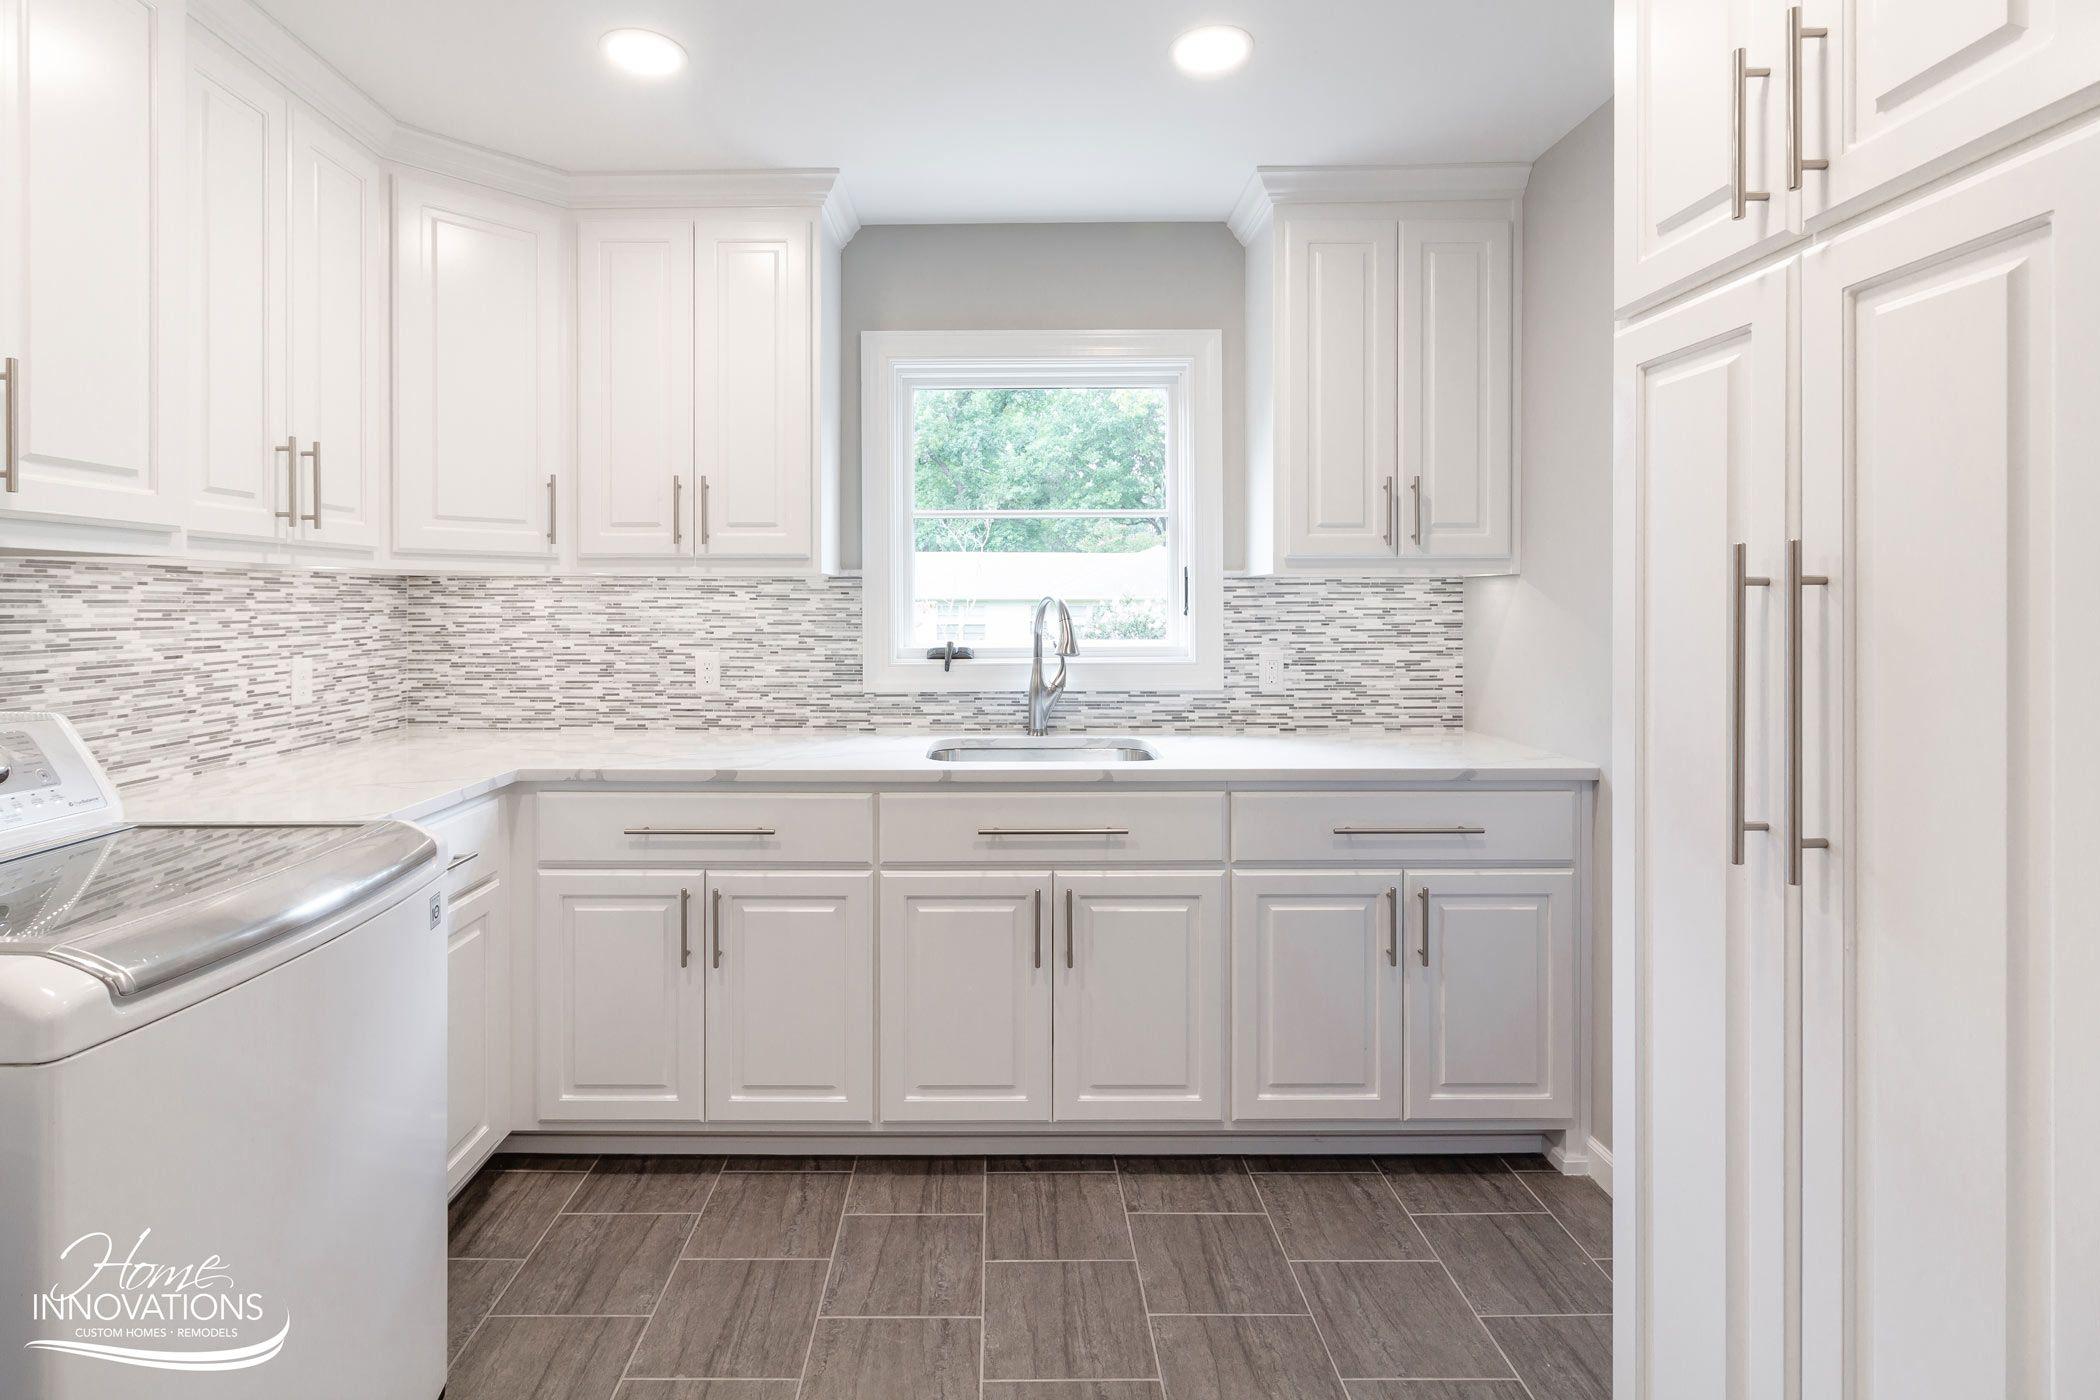 Laundry Room Tulsa Oklahoma Paint Cabinets White Home White Tile Backsplash